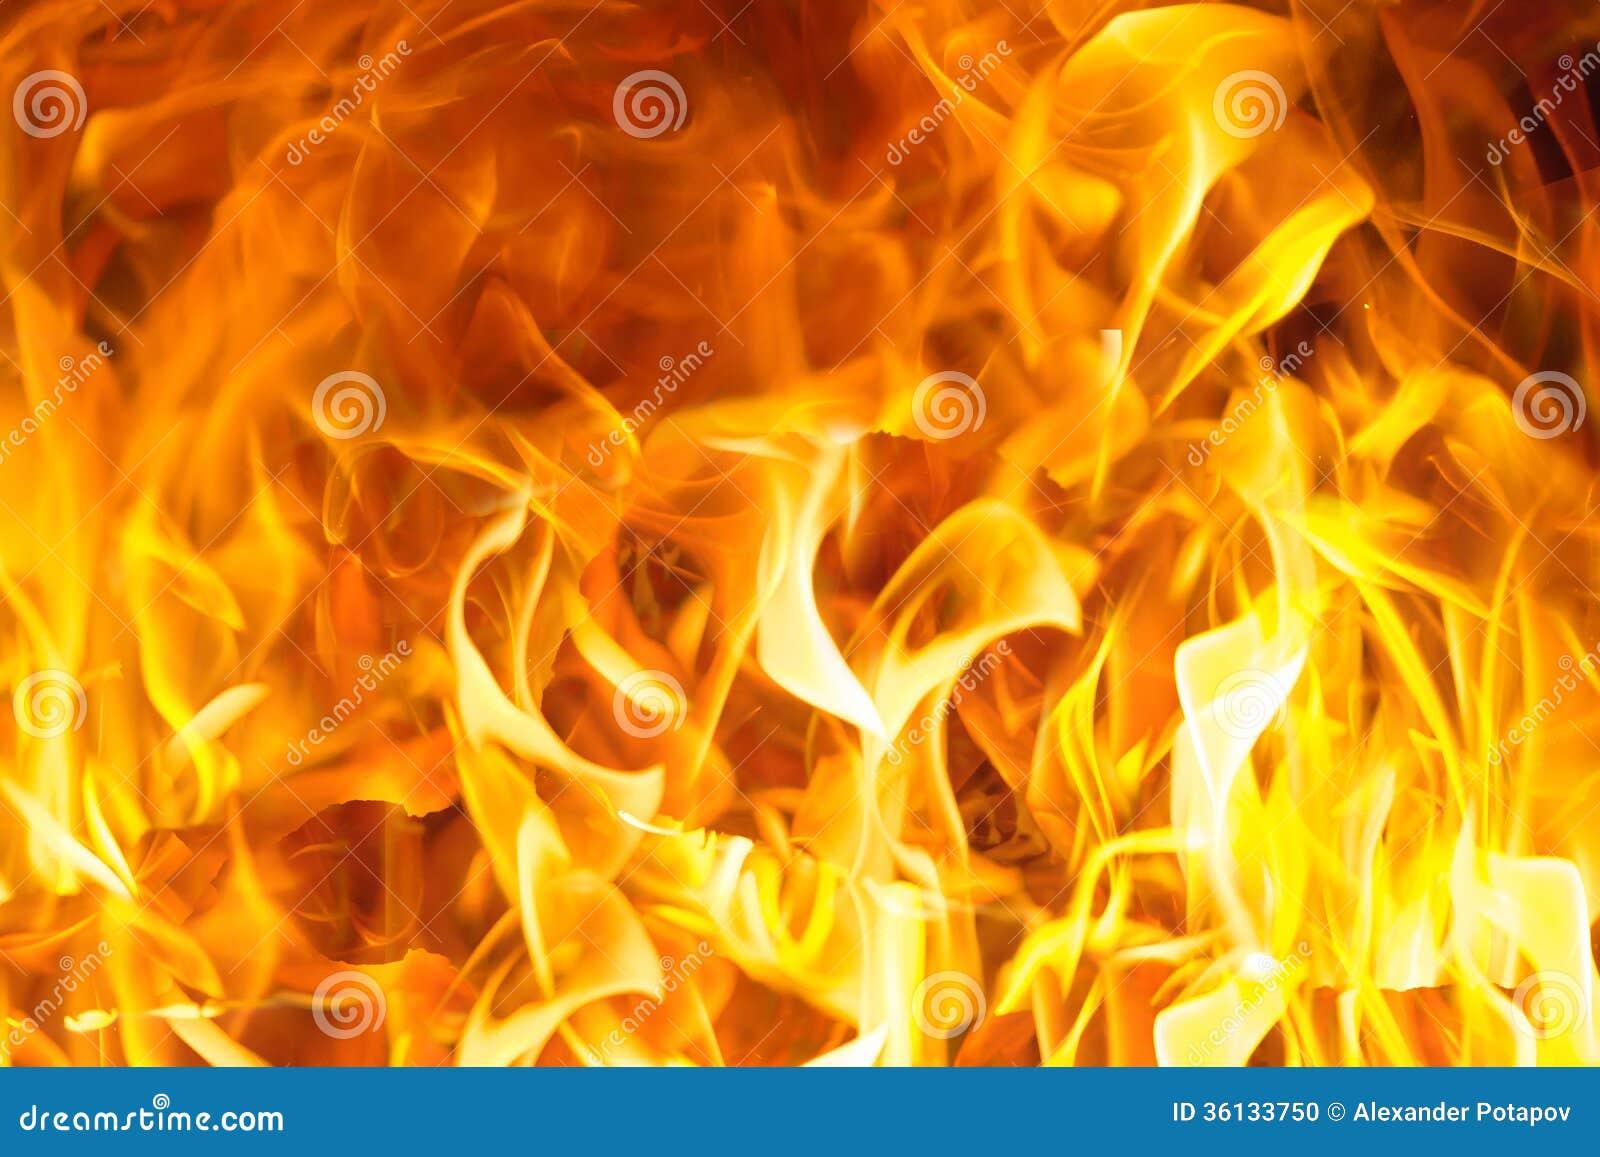 fond orange lumineux de flamme photo stock image 36133750. Black Bedroom Furniture Sets. Home Design Ideas